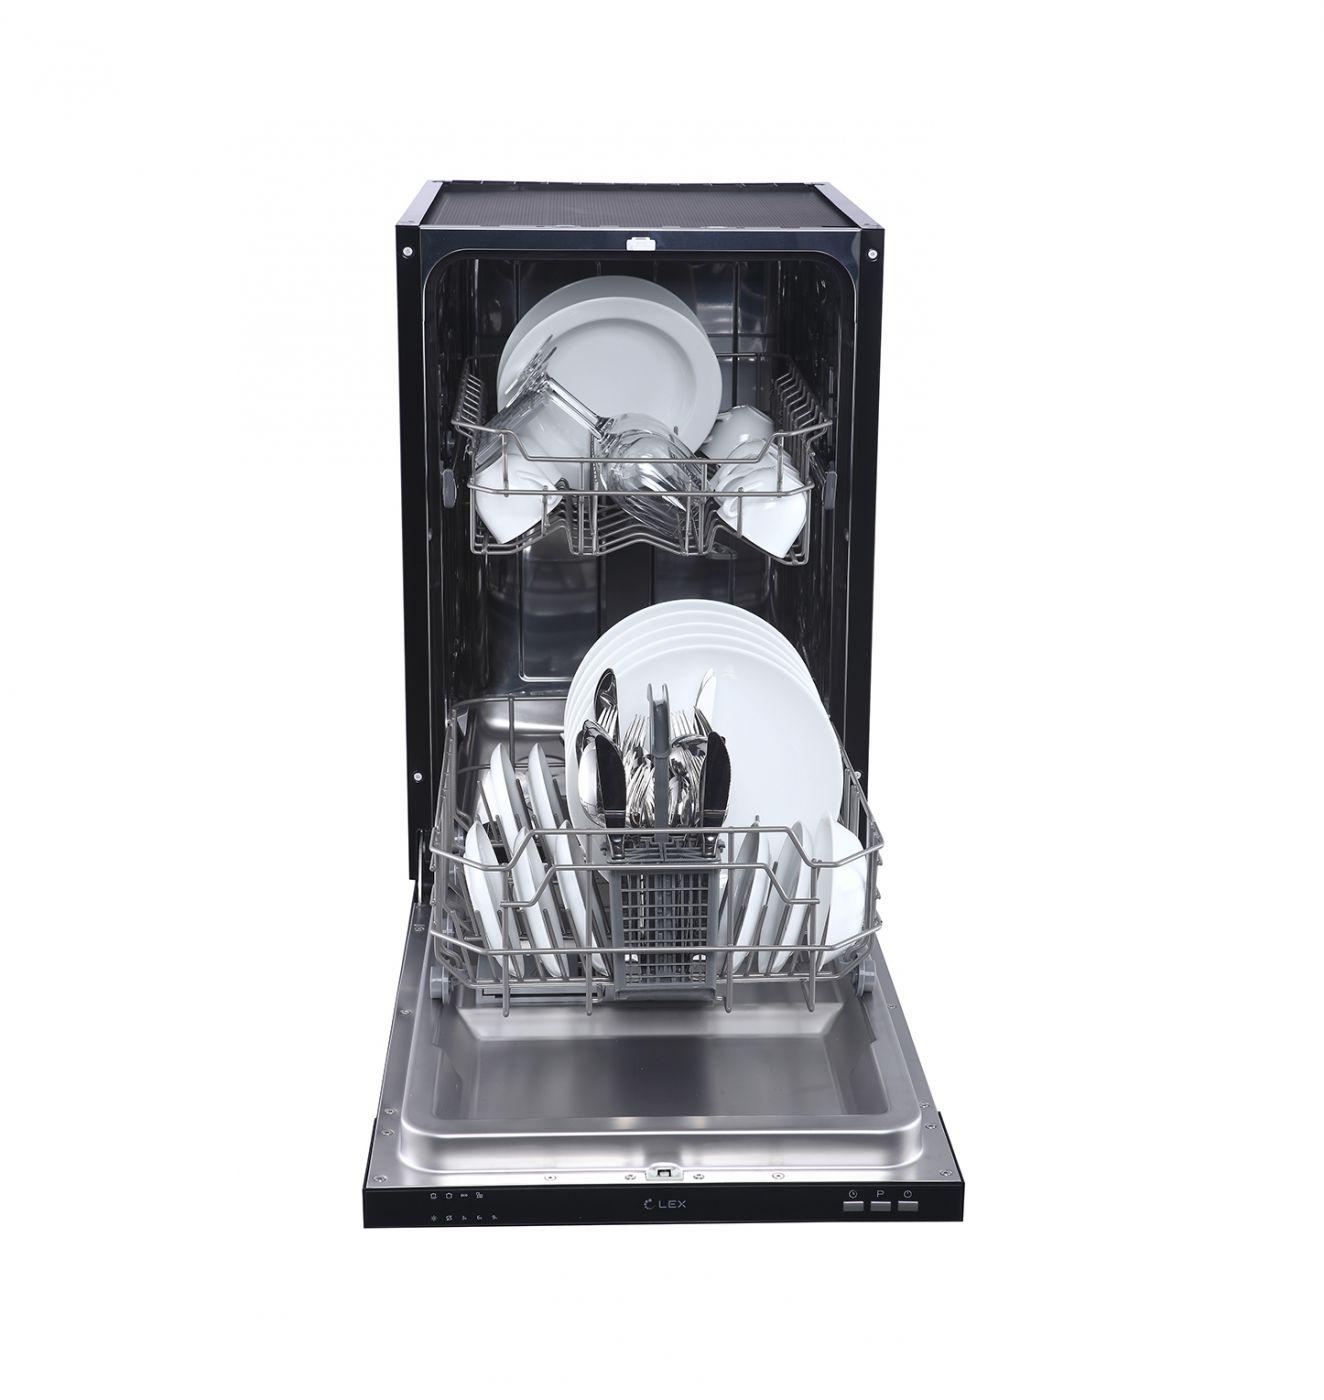 Посудомоечная машина LEX PM 4542 (CHMI000195)